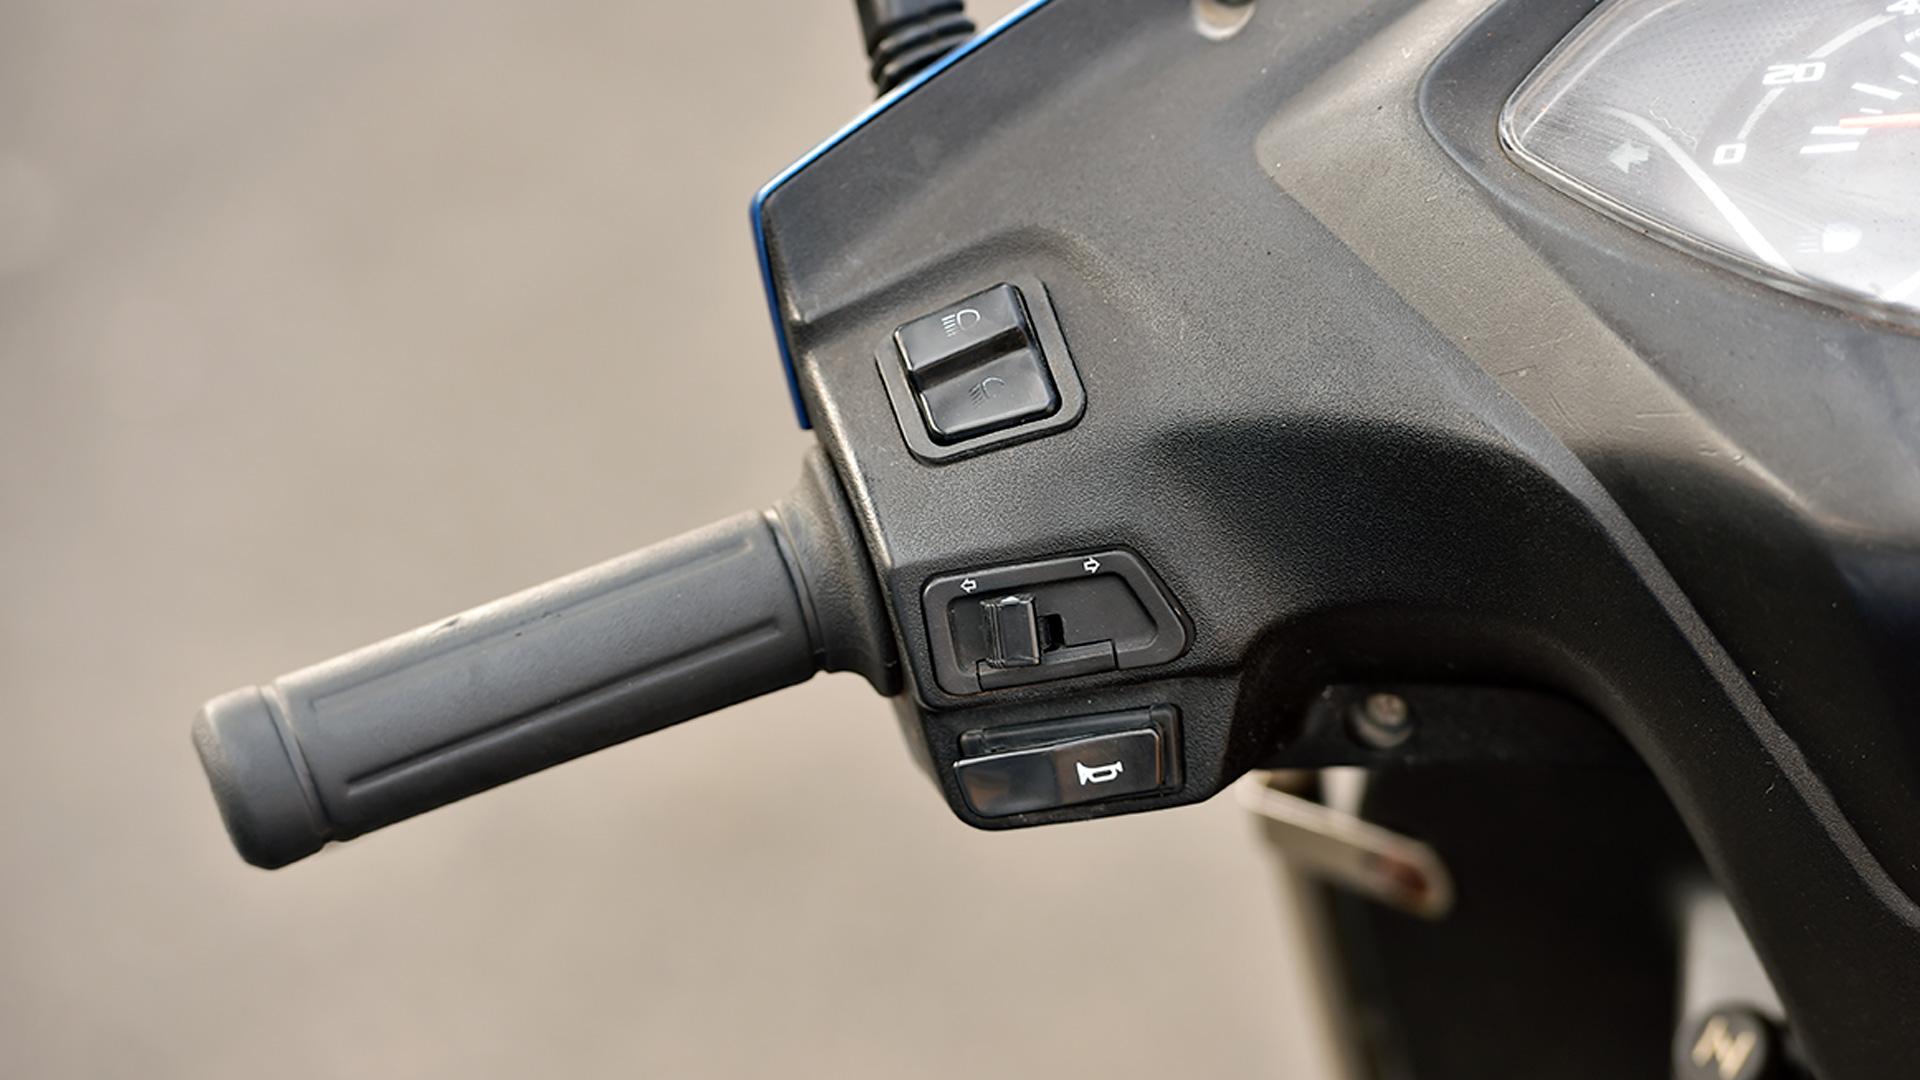 Honda Activa 2015 3g Price Mileage Reviews